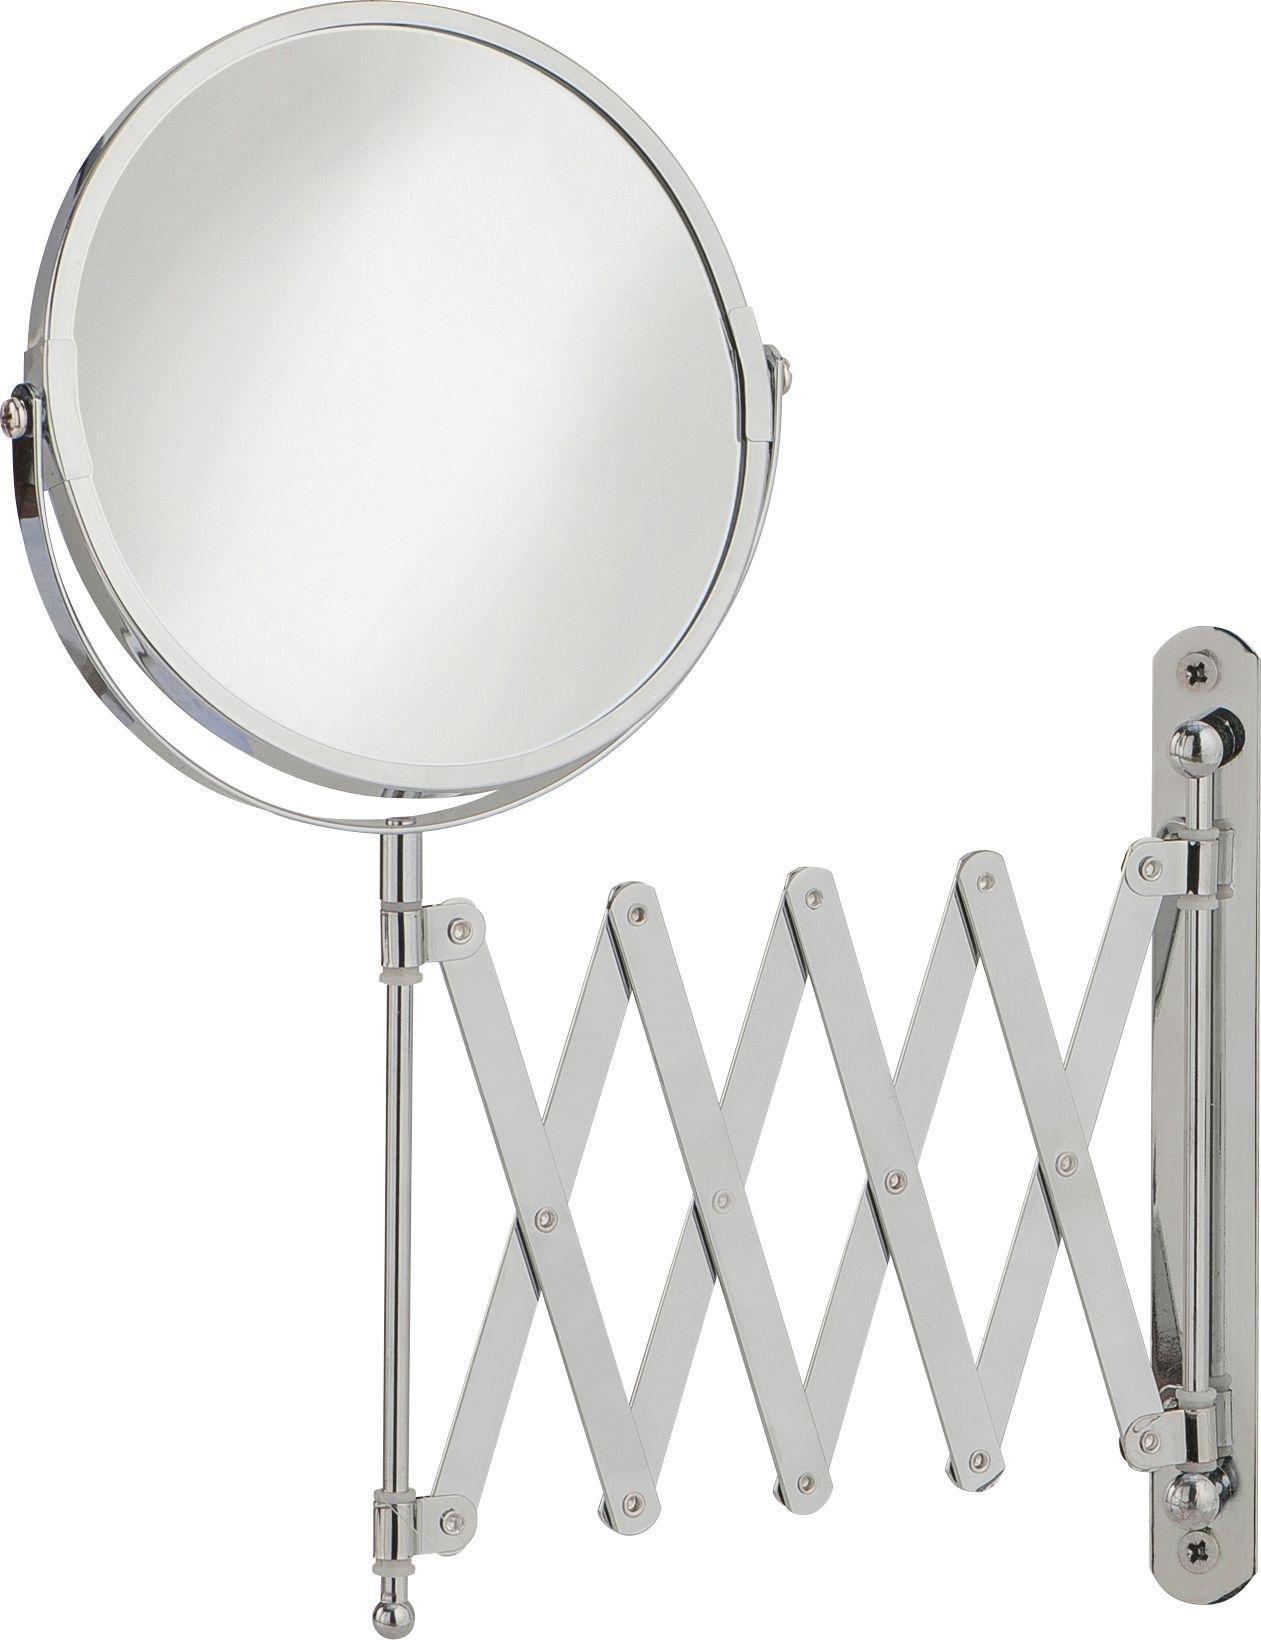 Argos Home Extendable Magnifying Shaving Mirror - Chrome